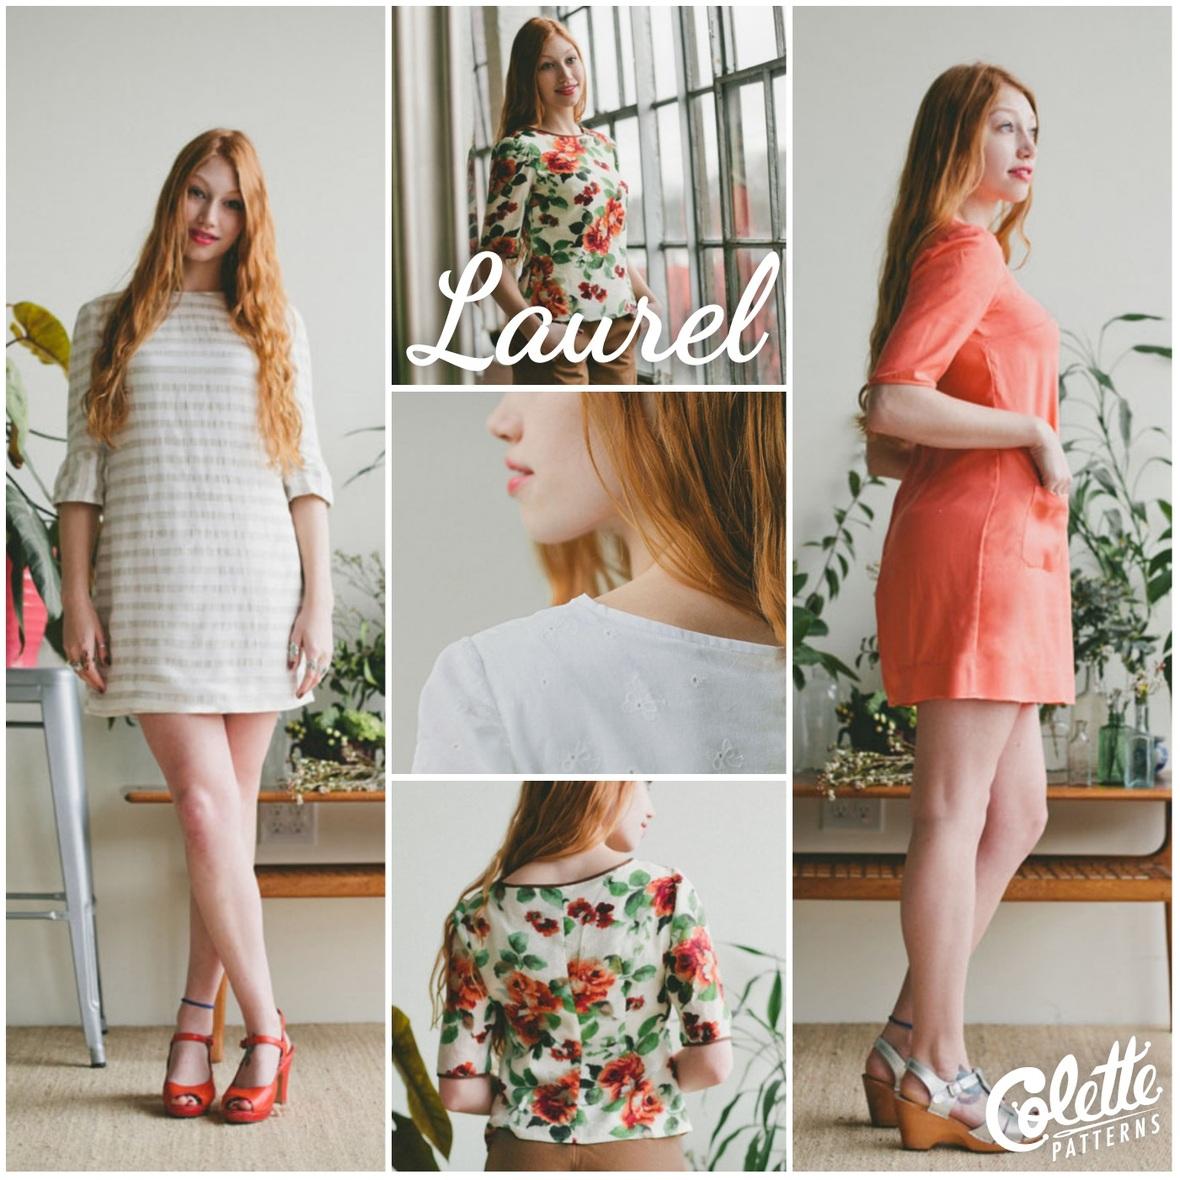 colette patterns laurel dress sewing pattern